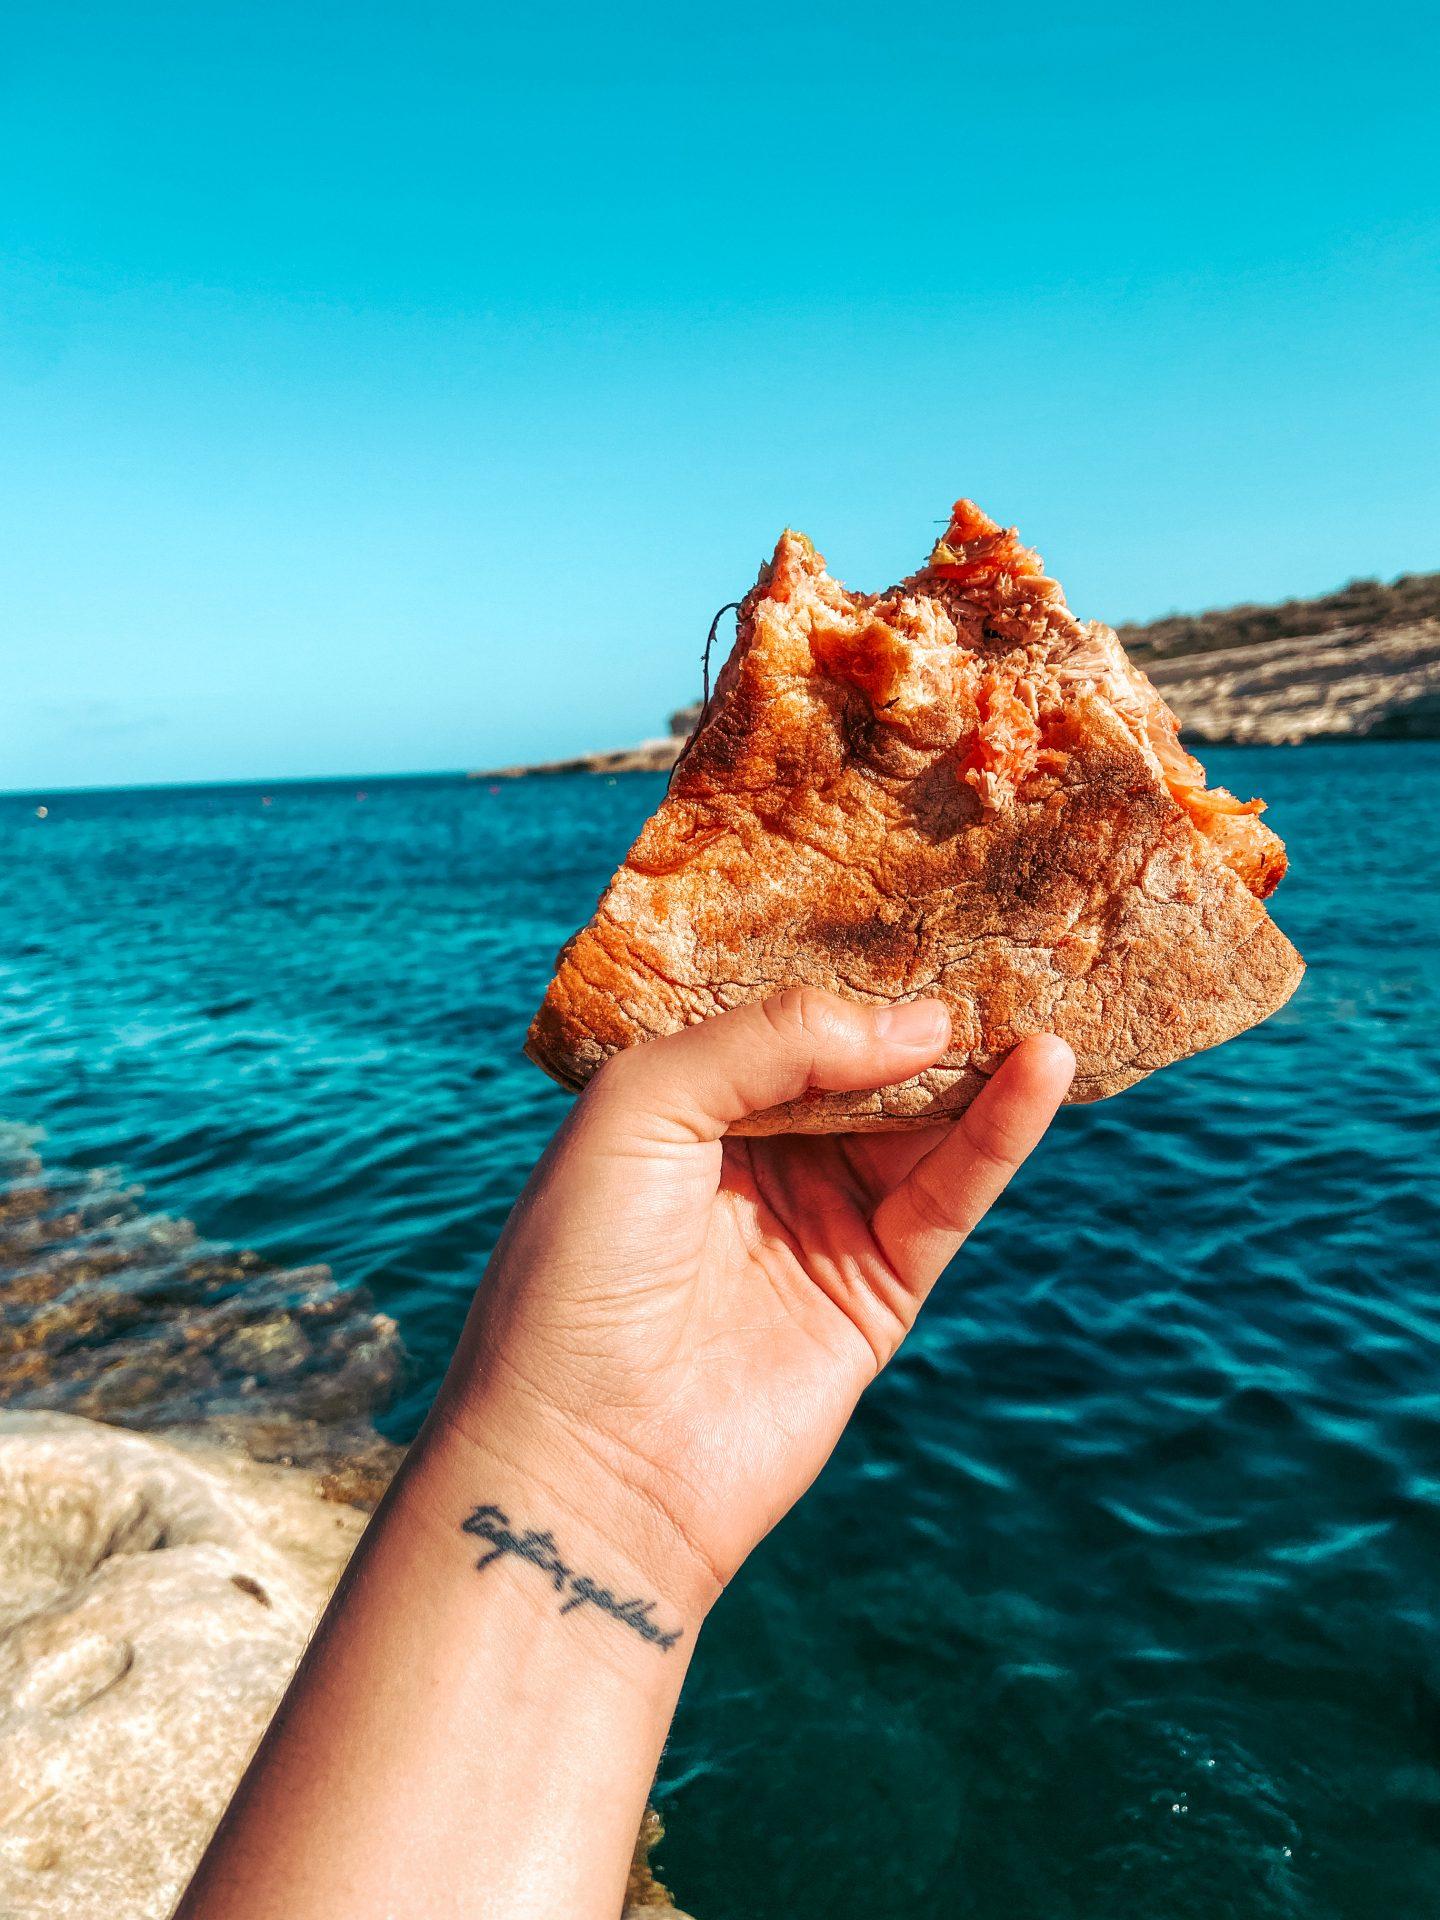 ftira-biz-zejt-malta-traditional-food